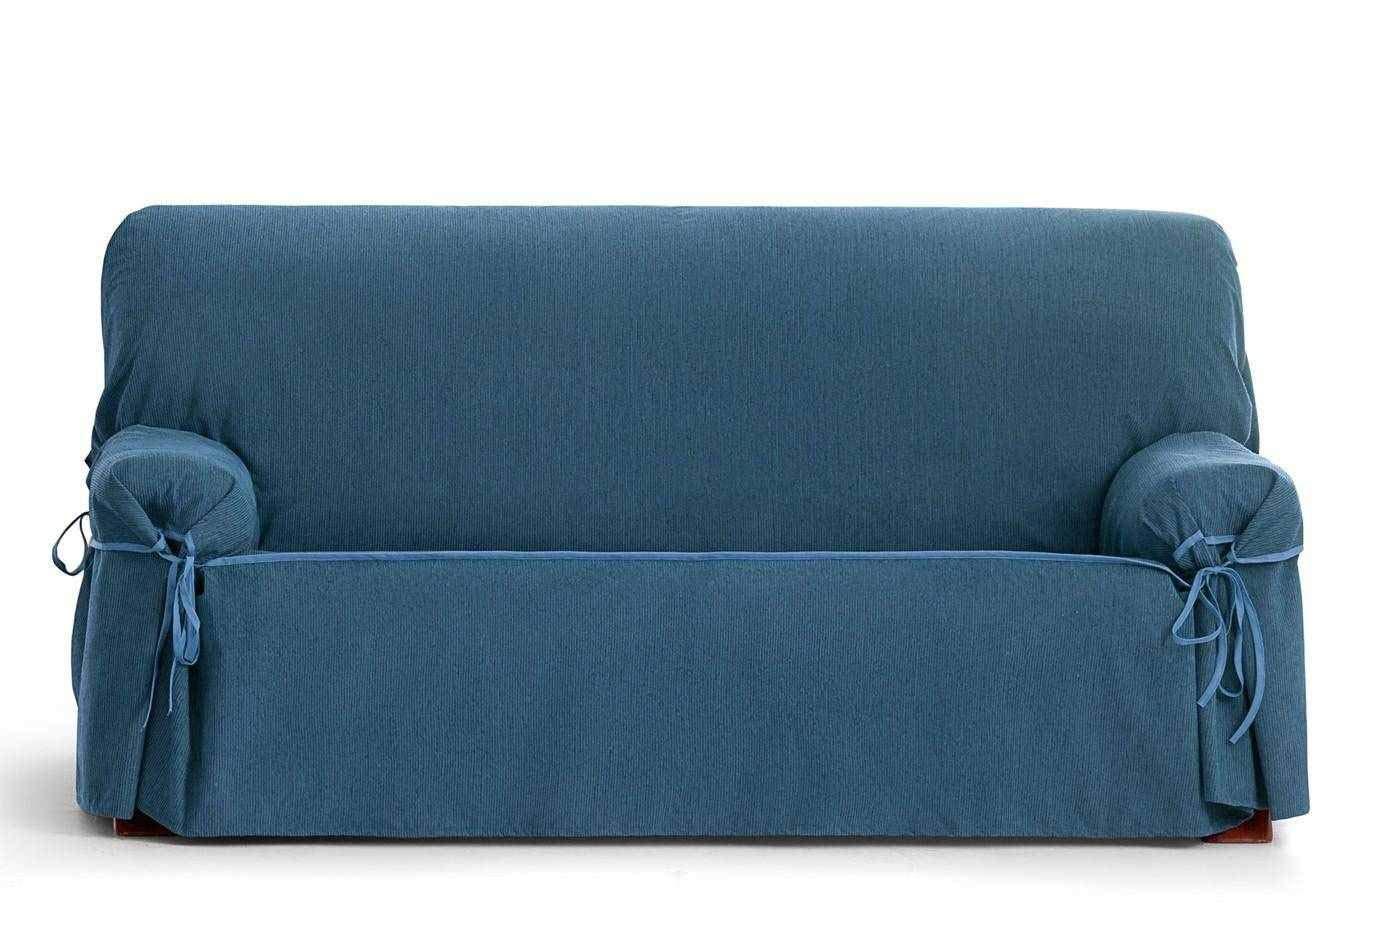 Jarrous Funda de Sofá Universal Impermeable Modelo Córdoba, Color Azul-03, Medida 2 Plazas